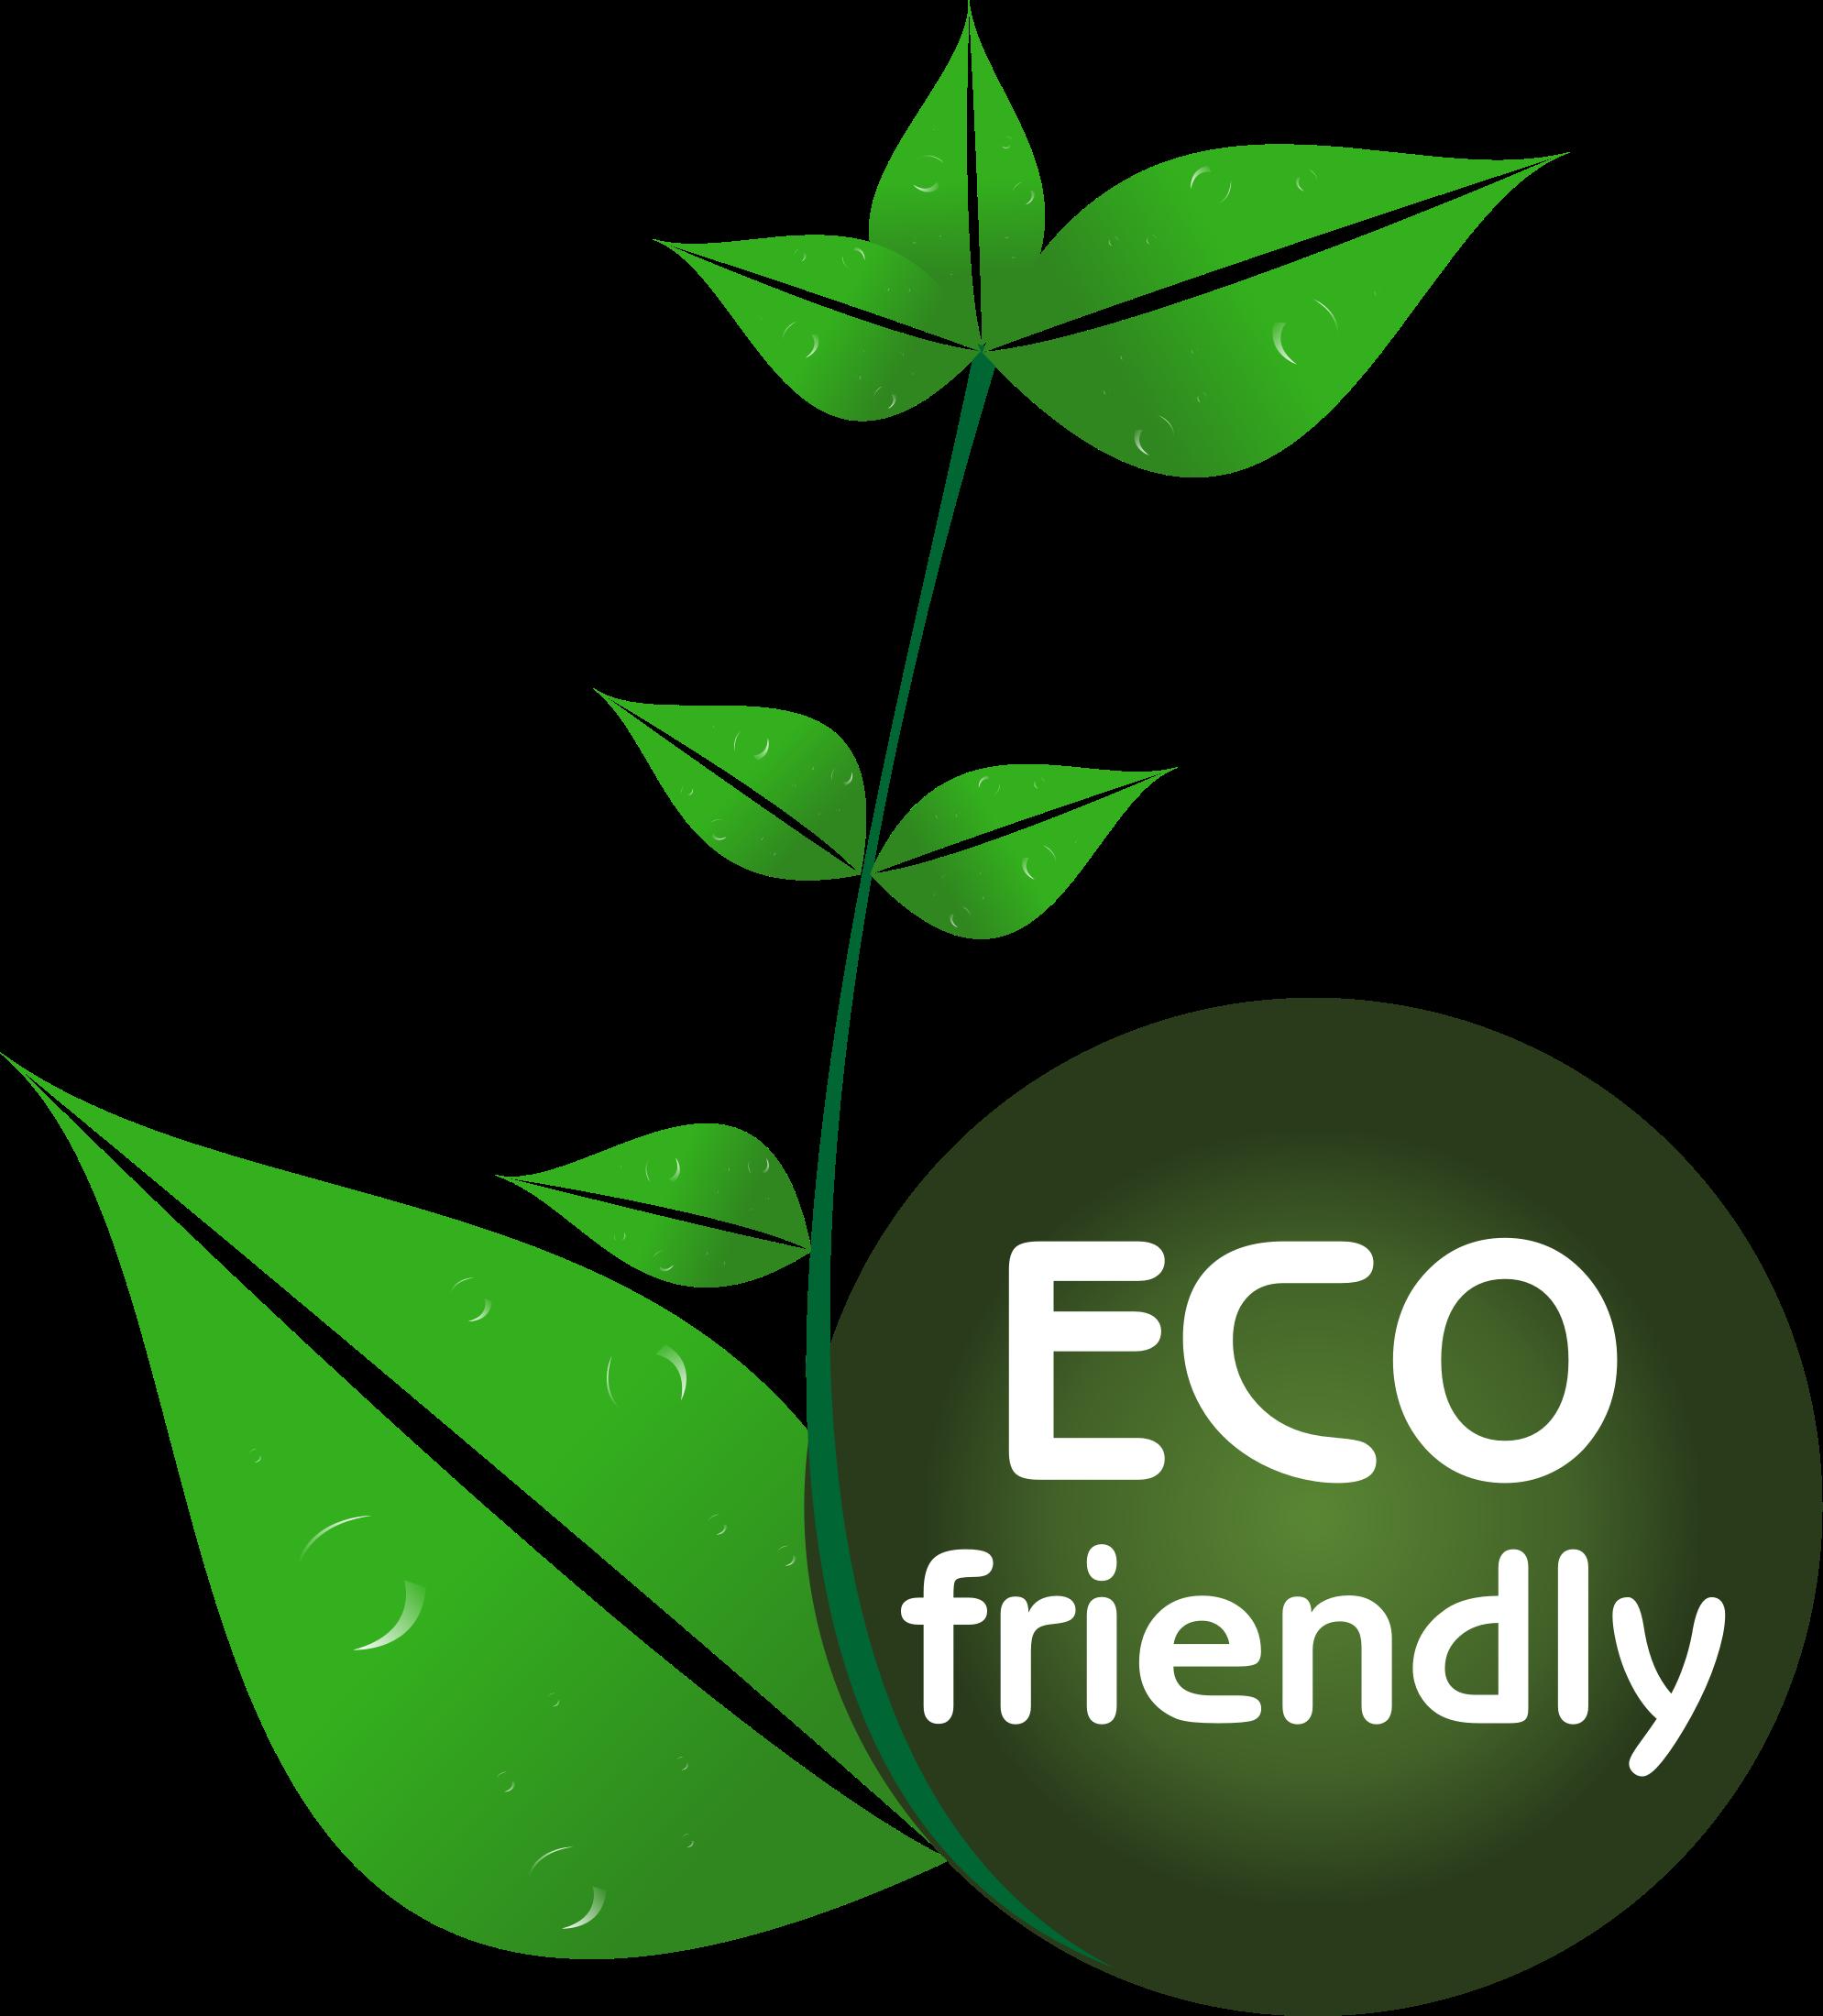 collection of environmentally. Environment clipart eco friendly